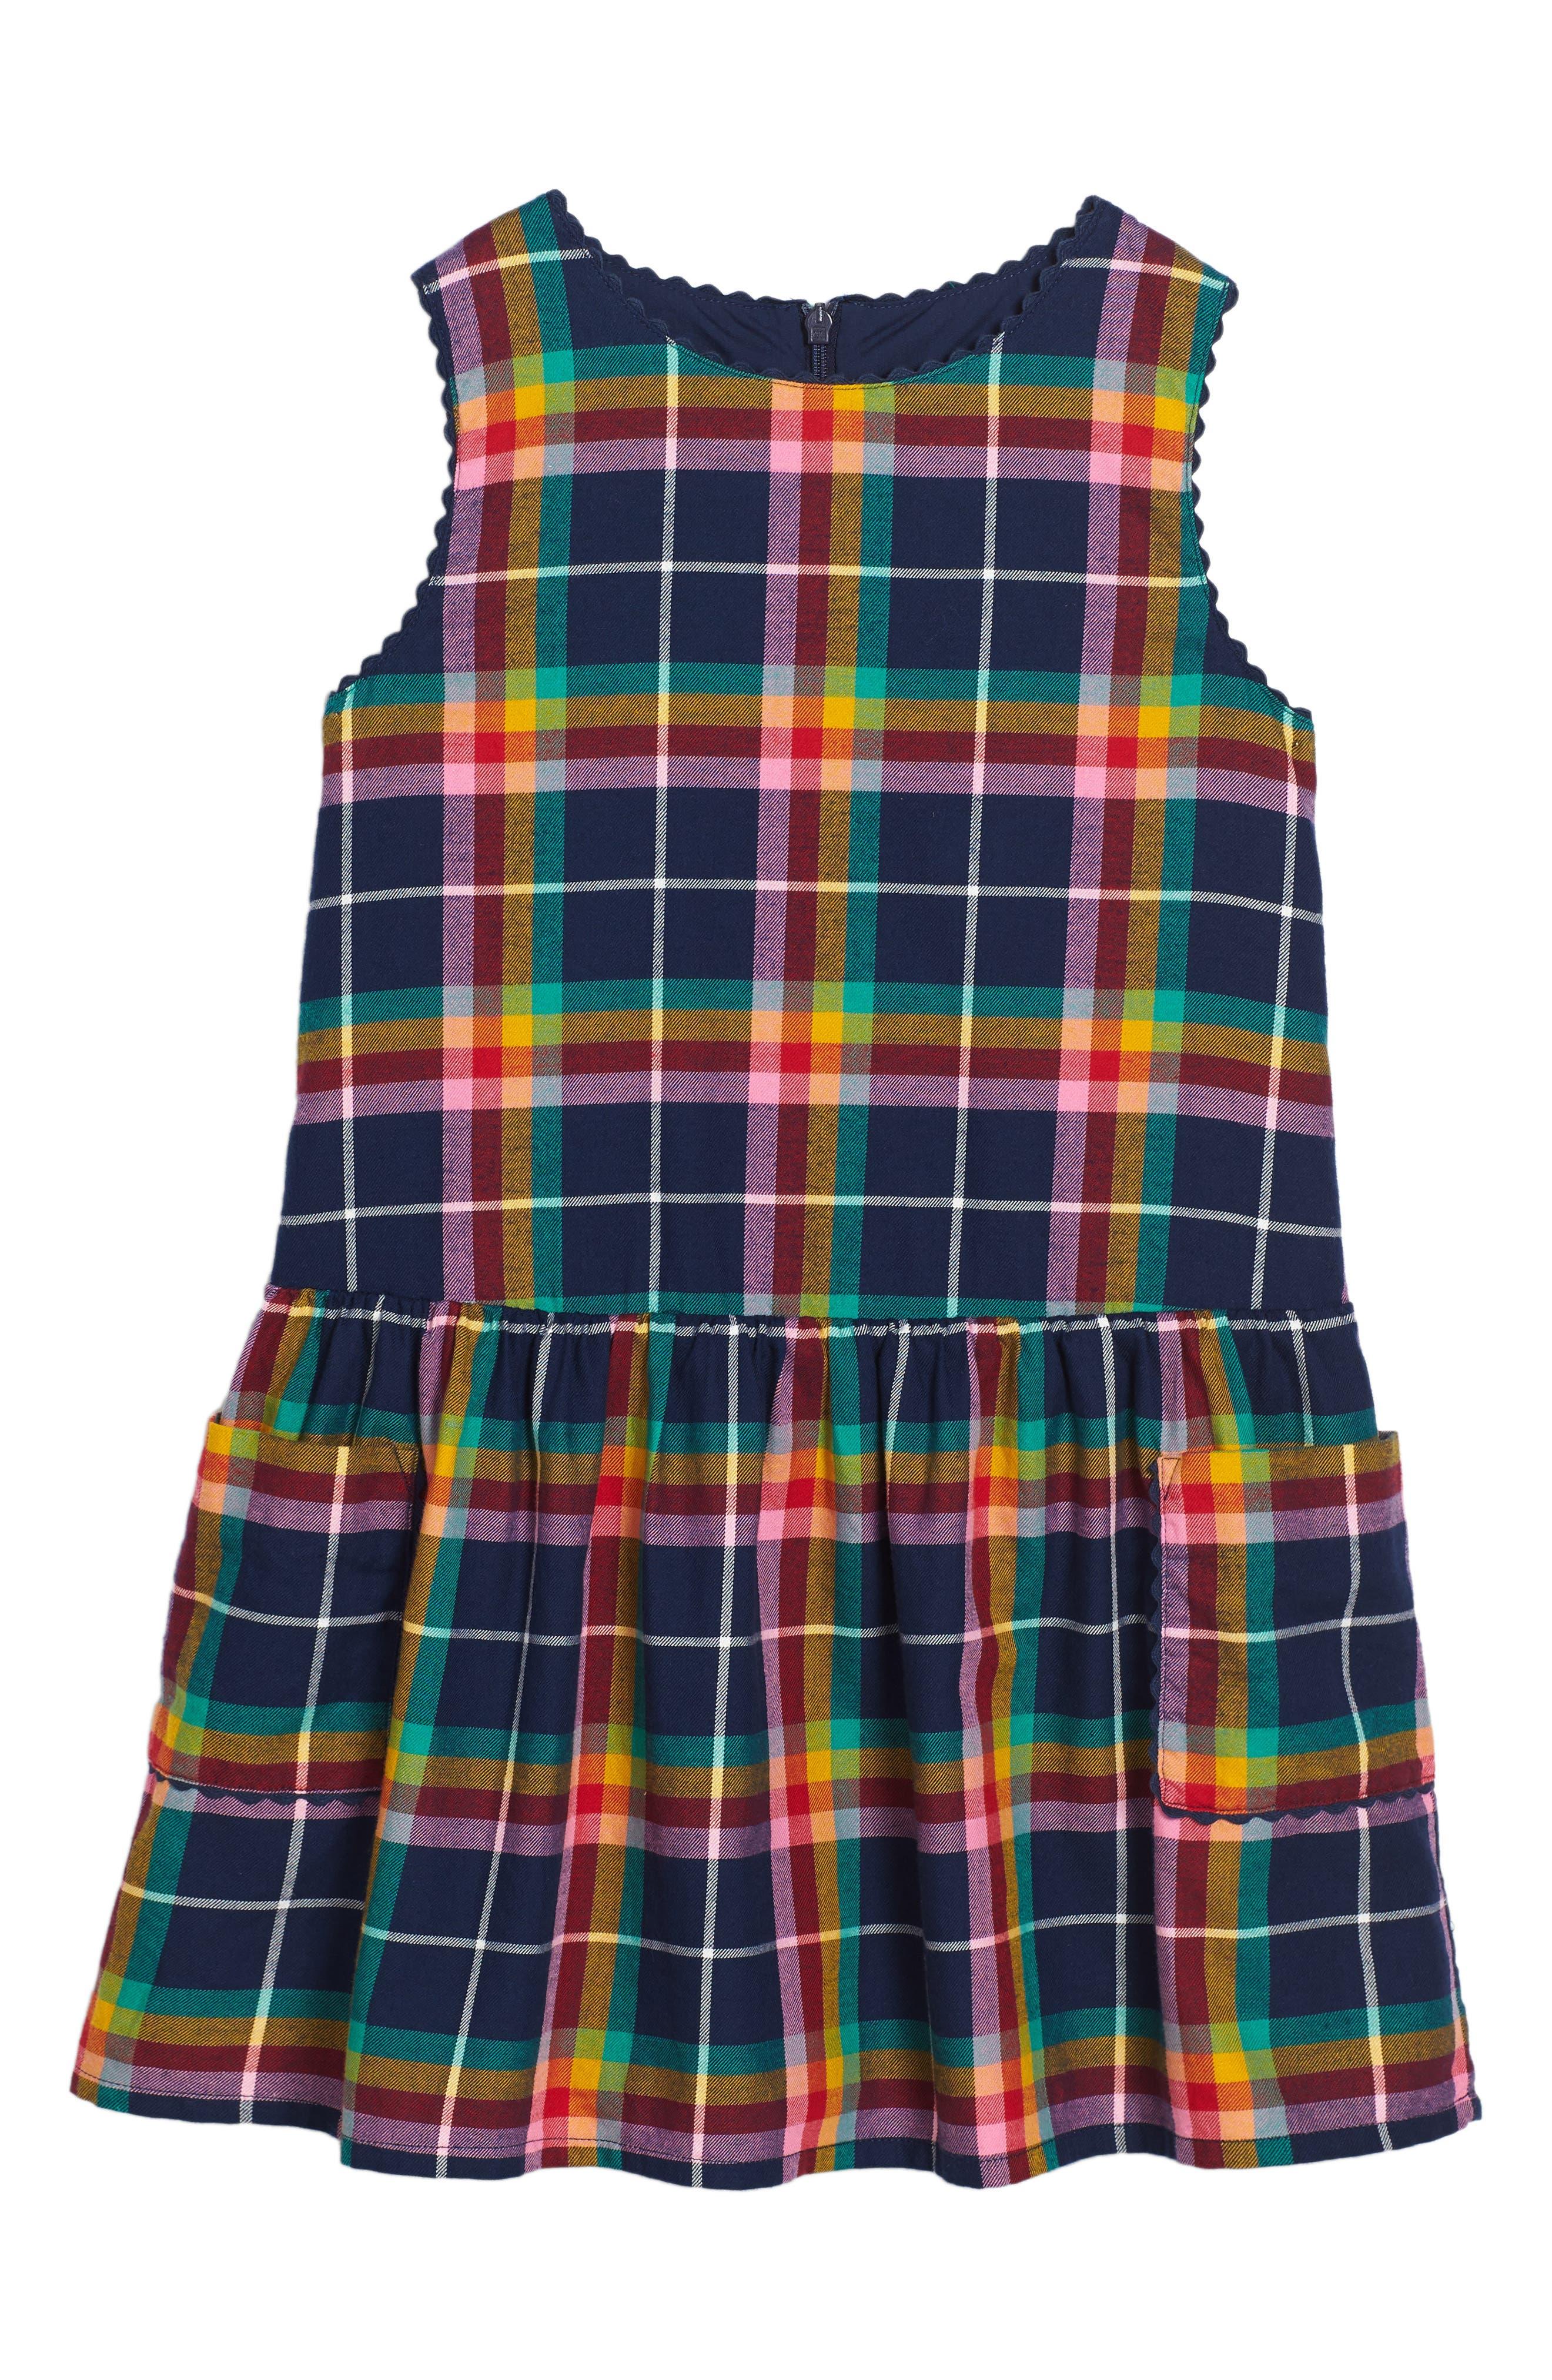 Main Image - Mini Boden Plaid Pinafore Dress (Toddler Girls, Little Girls & Big Girls)